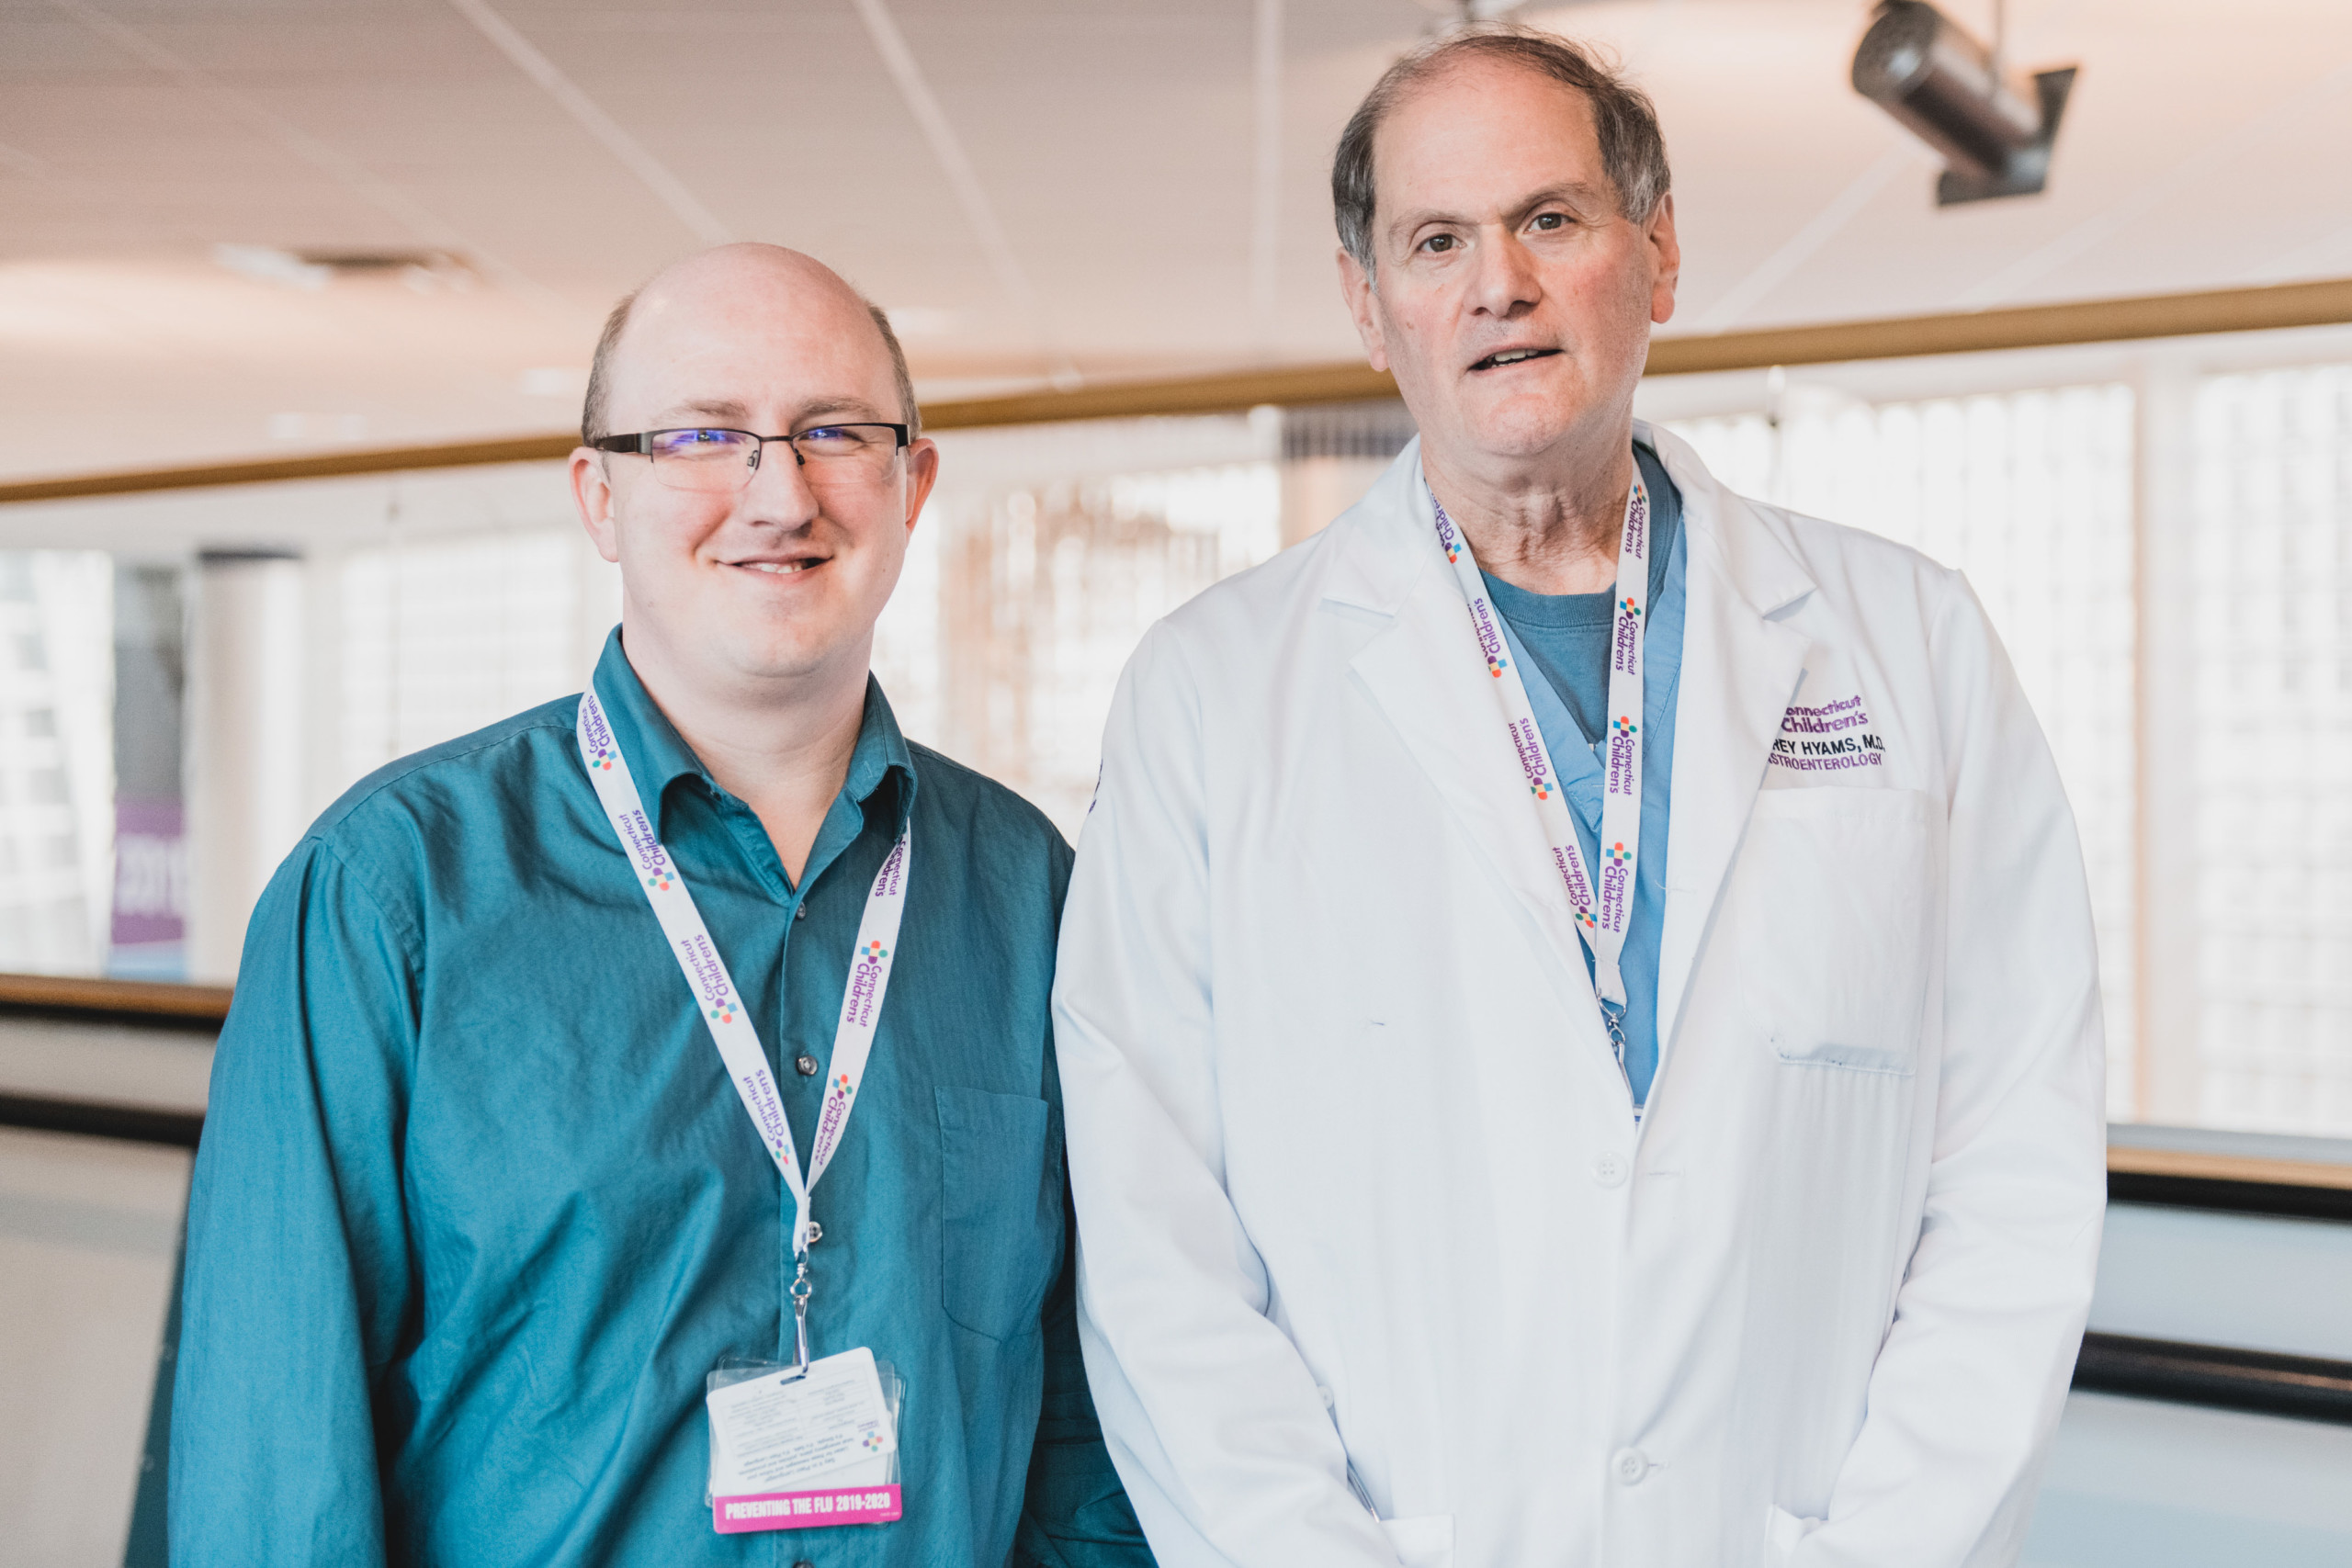 John Hoffman with Dr. Jeffrey Hyams, Division Head of Gastroenterology